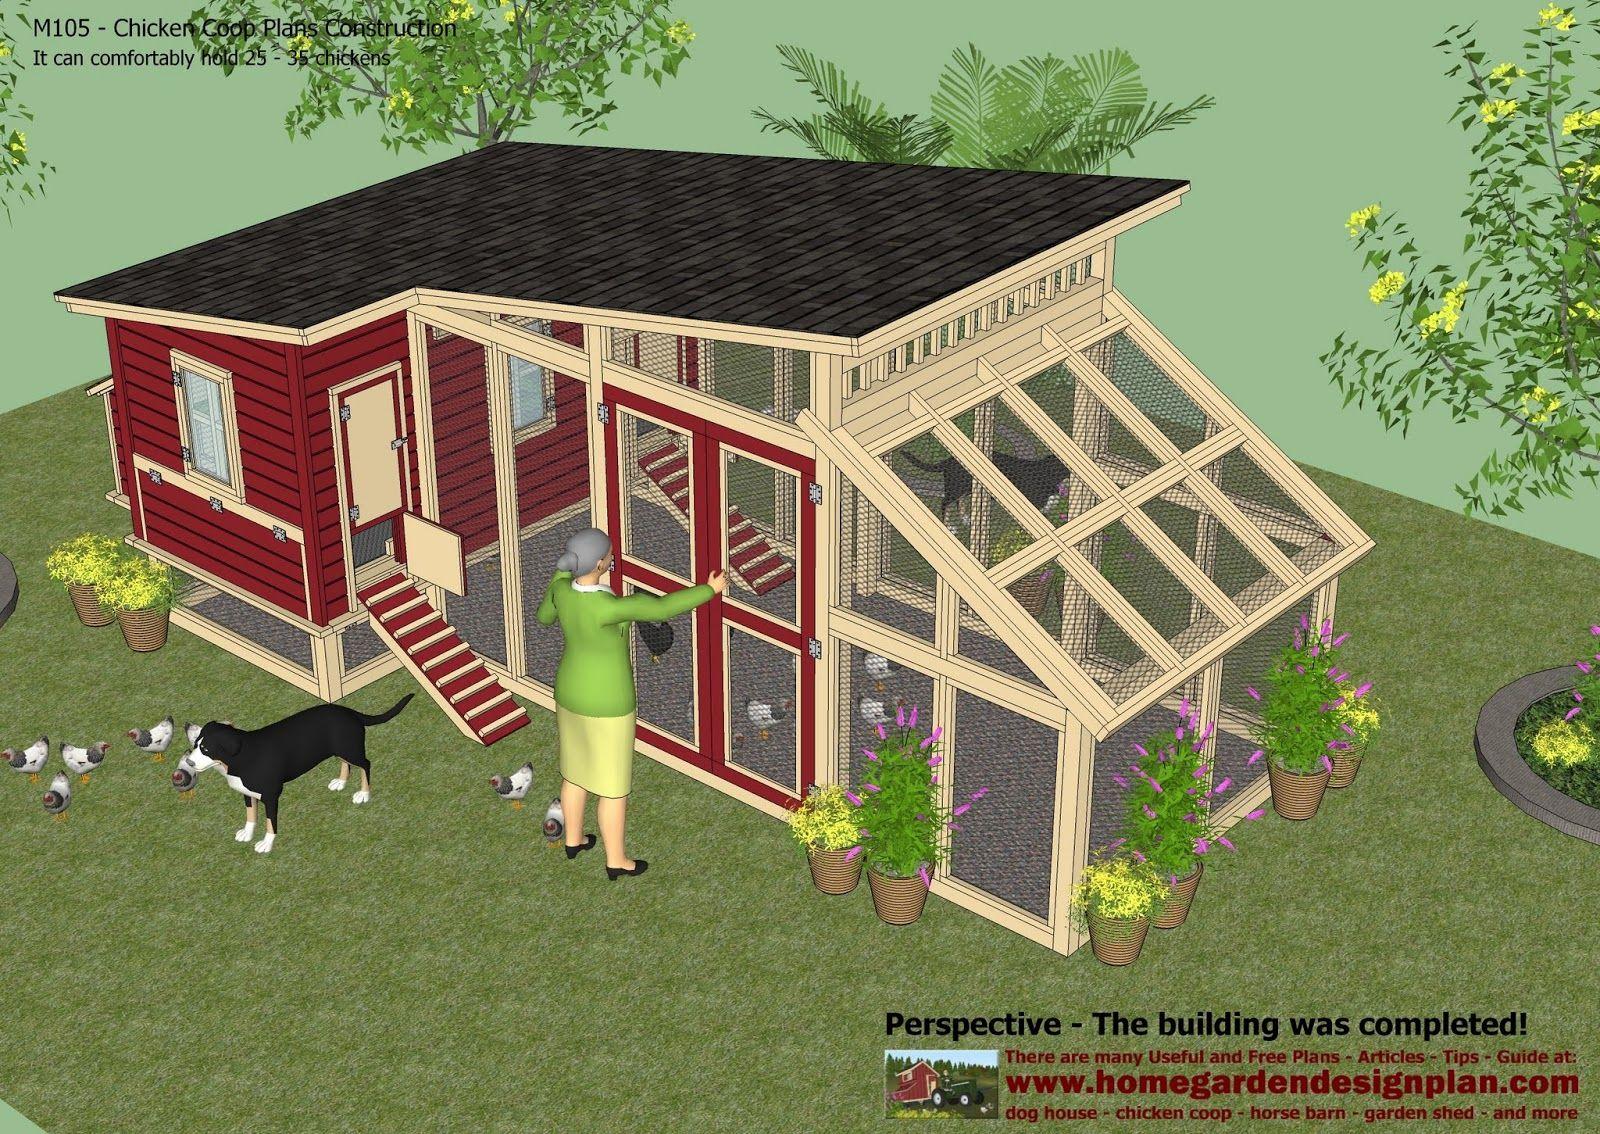 M105 Chicken Coop Plans Construction Chicken Coop Design How To Build A Chicken Coop